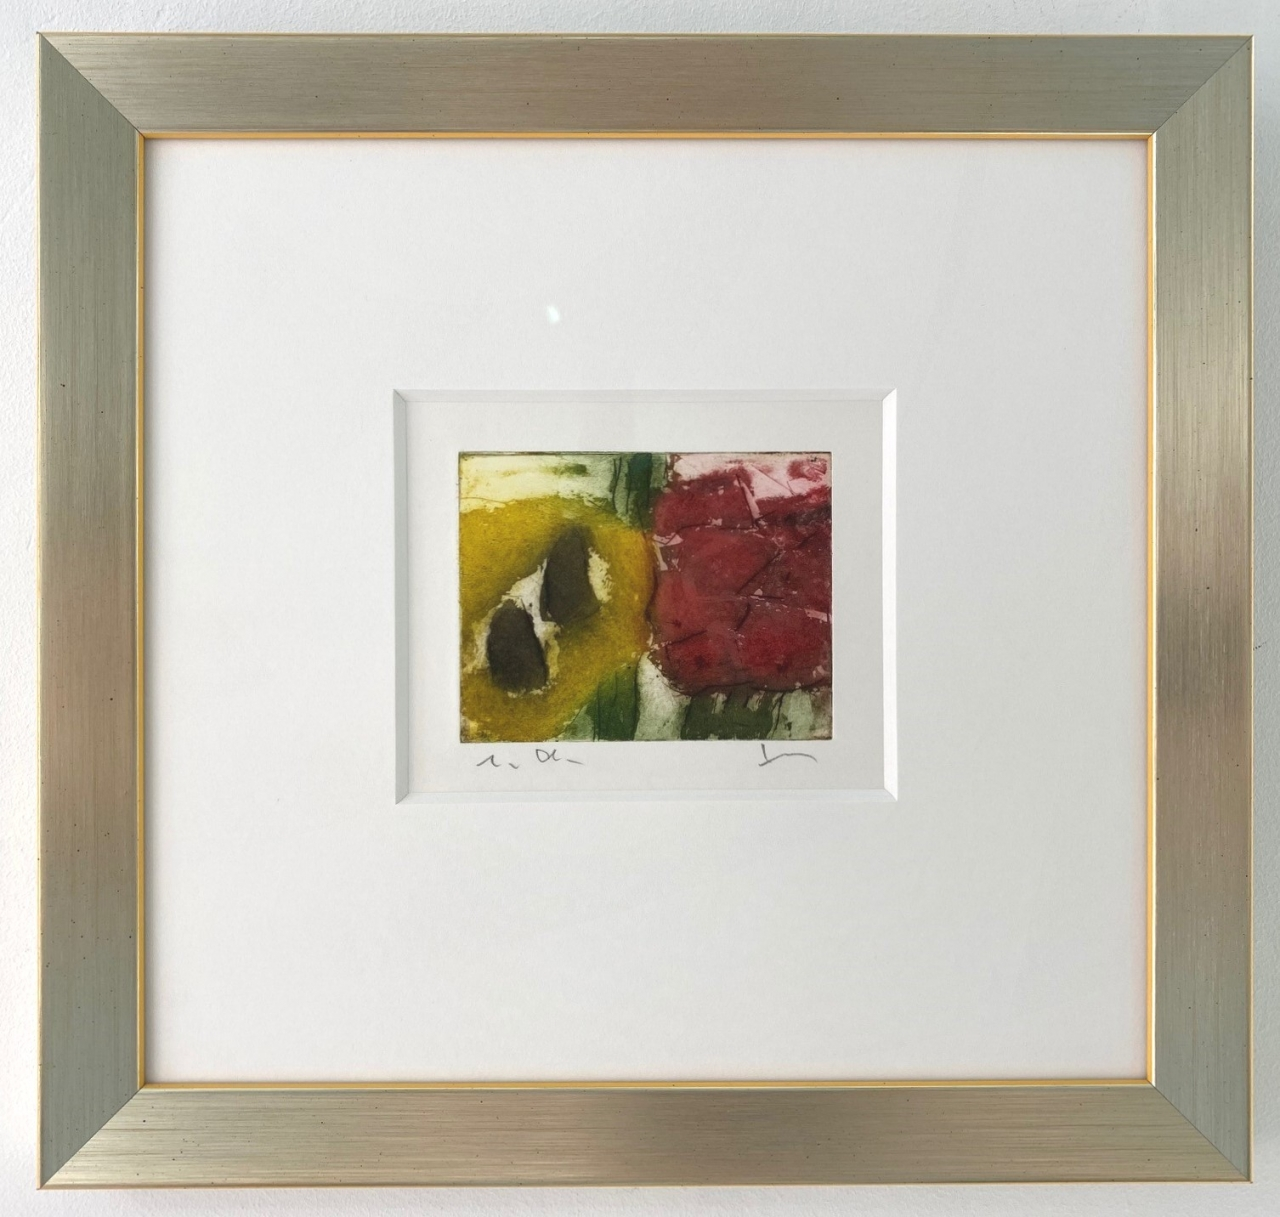 Rudbeckia, gerahmt (Silber-gelb)